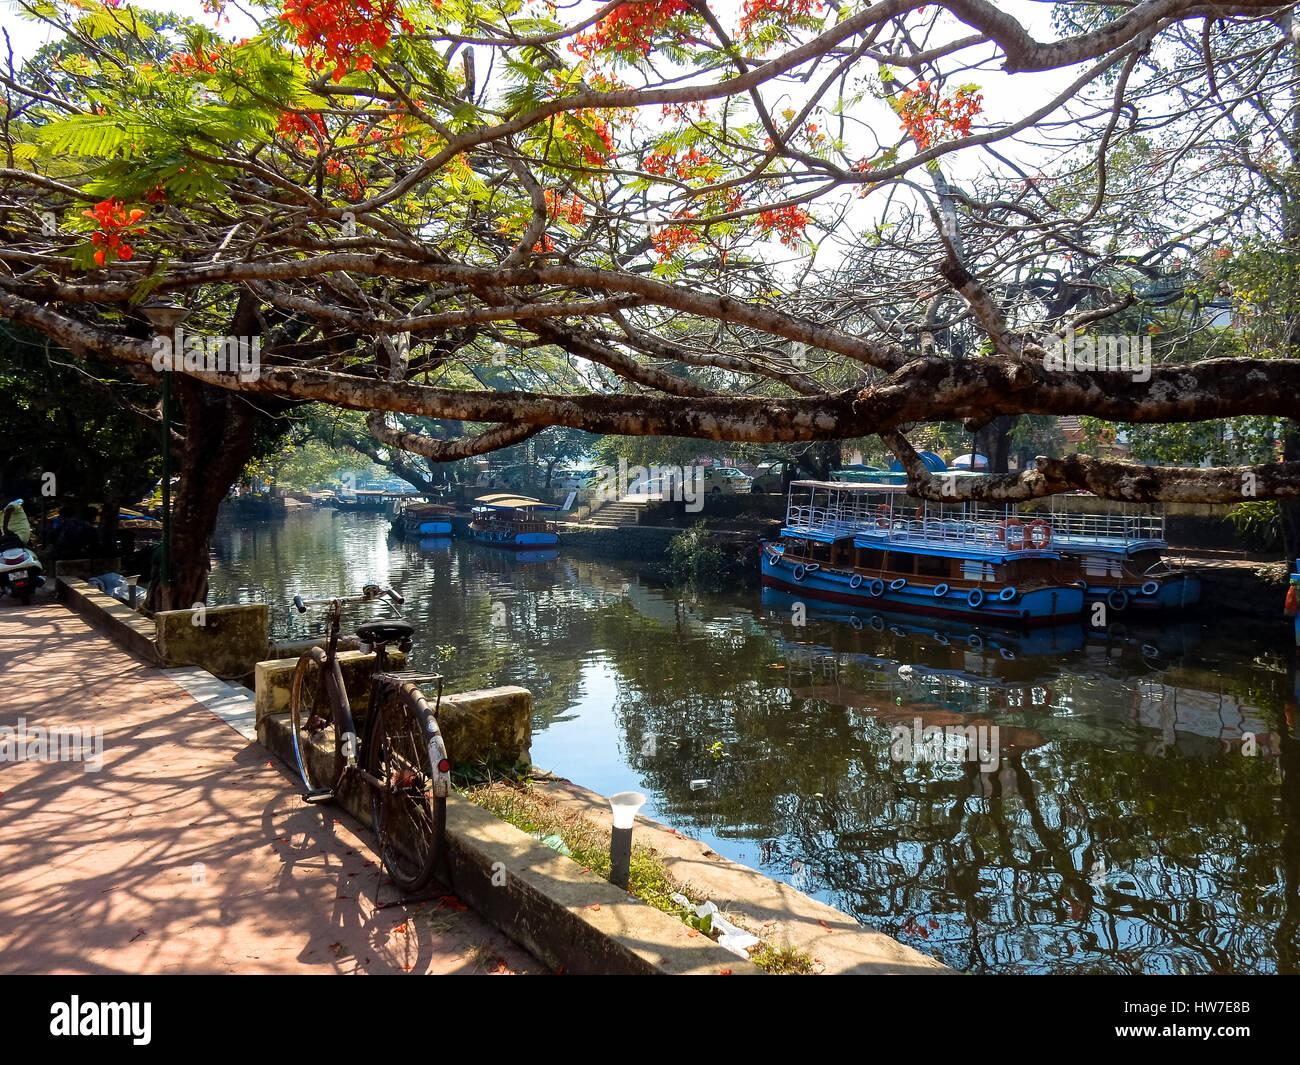 Lagune con houseboat in alleppey ,Kerala, India Immagini Stock